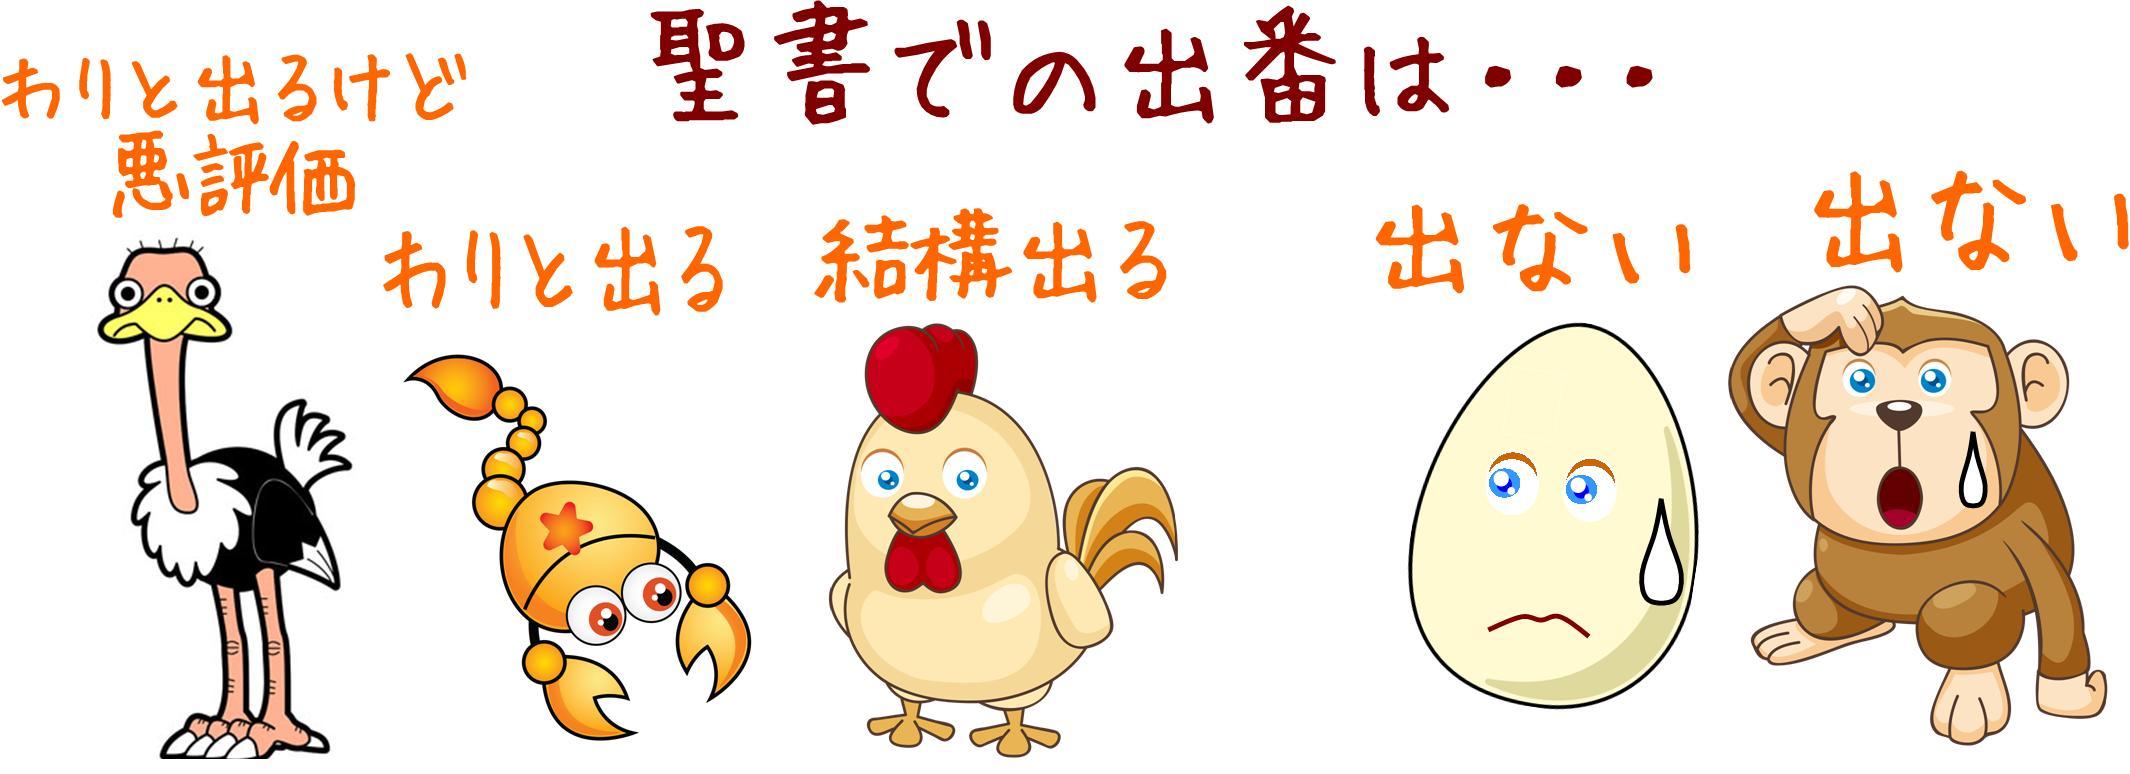 seisho_tamago.jpg